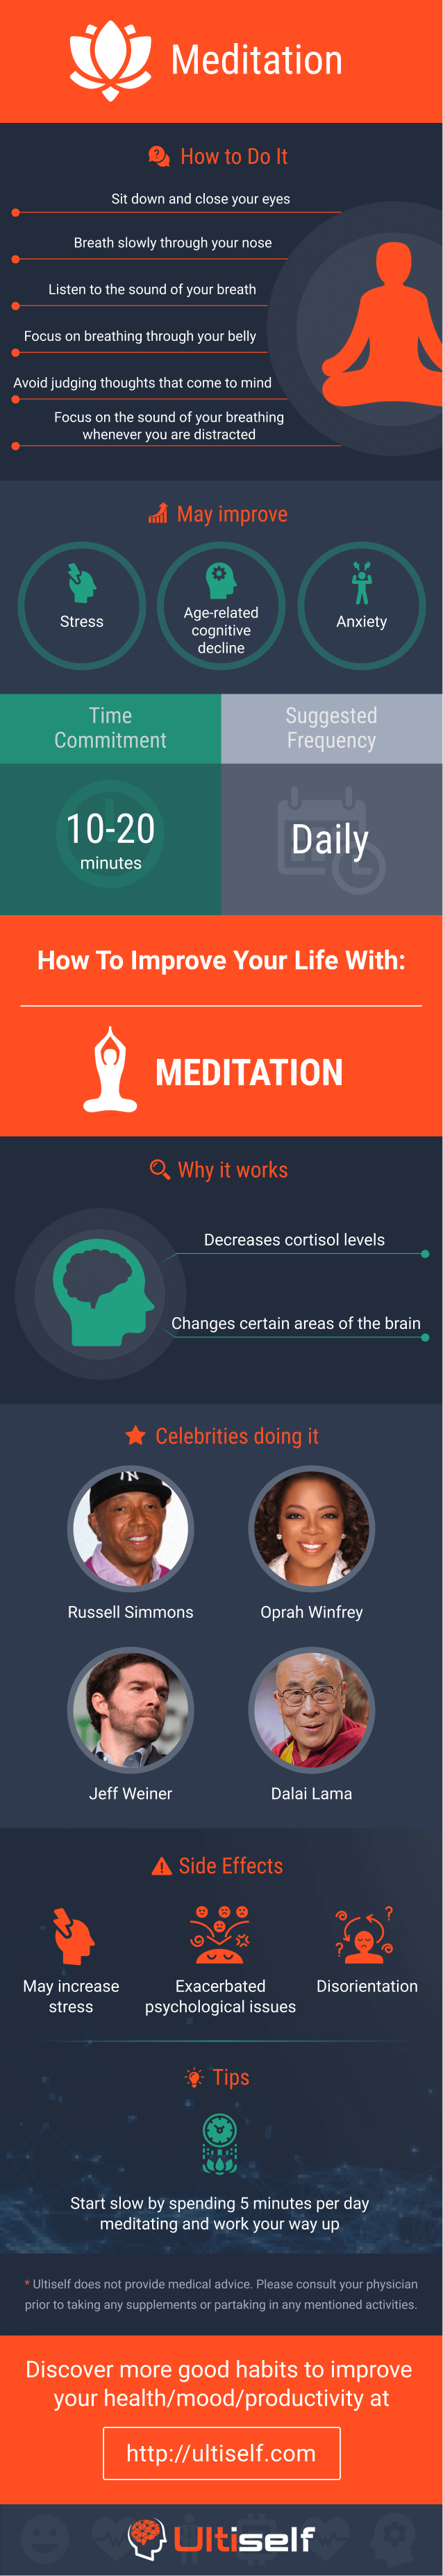 Meditation infographic